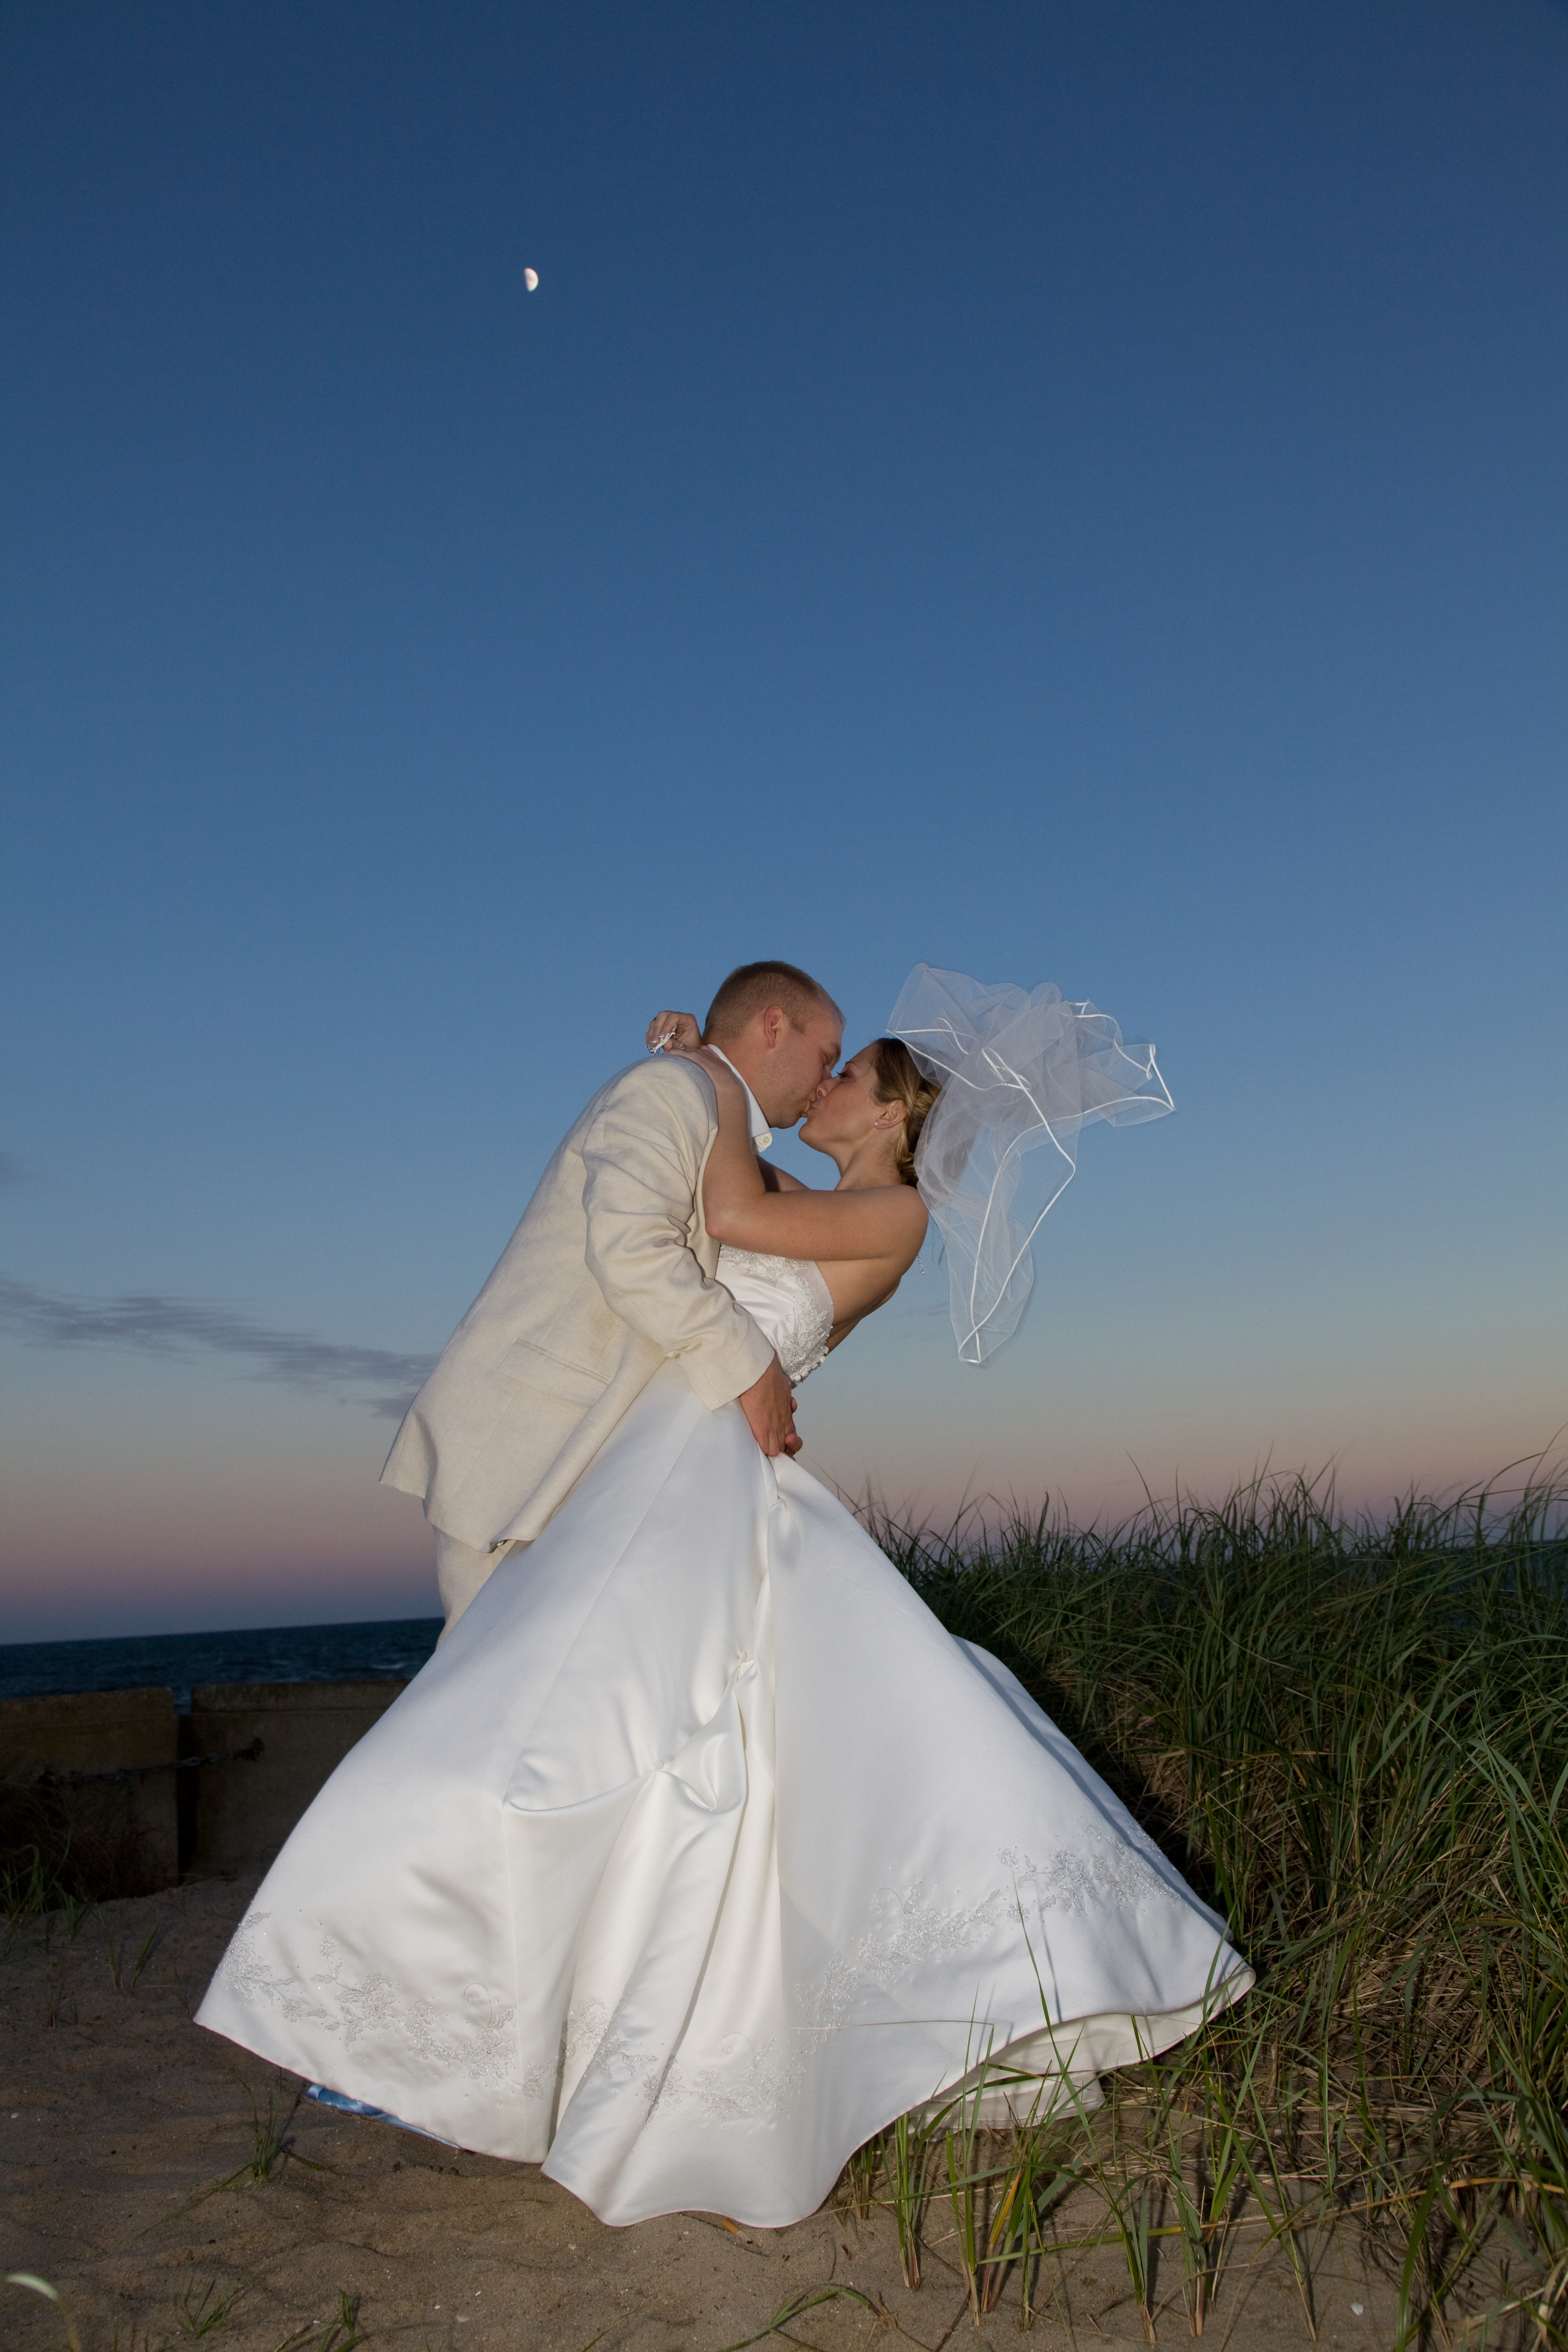 Cape Cod Photographer & Videographer